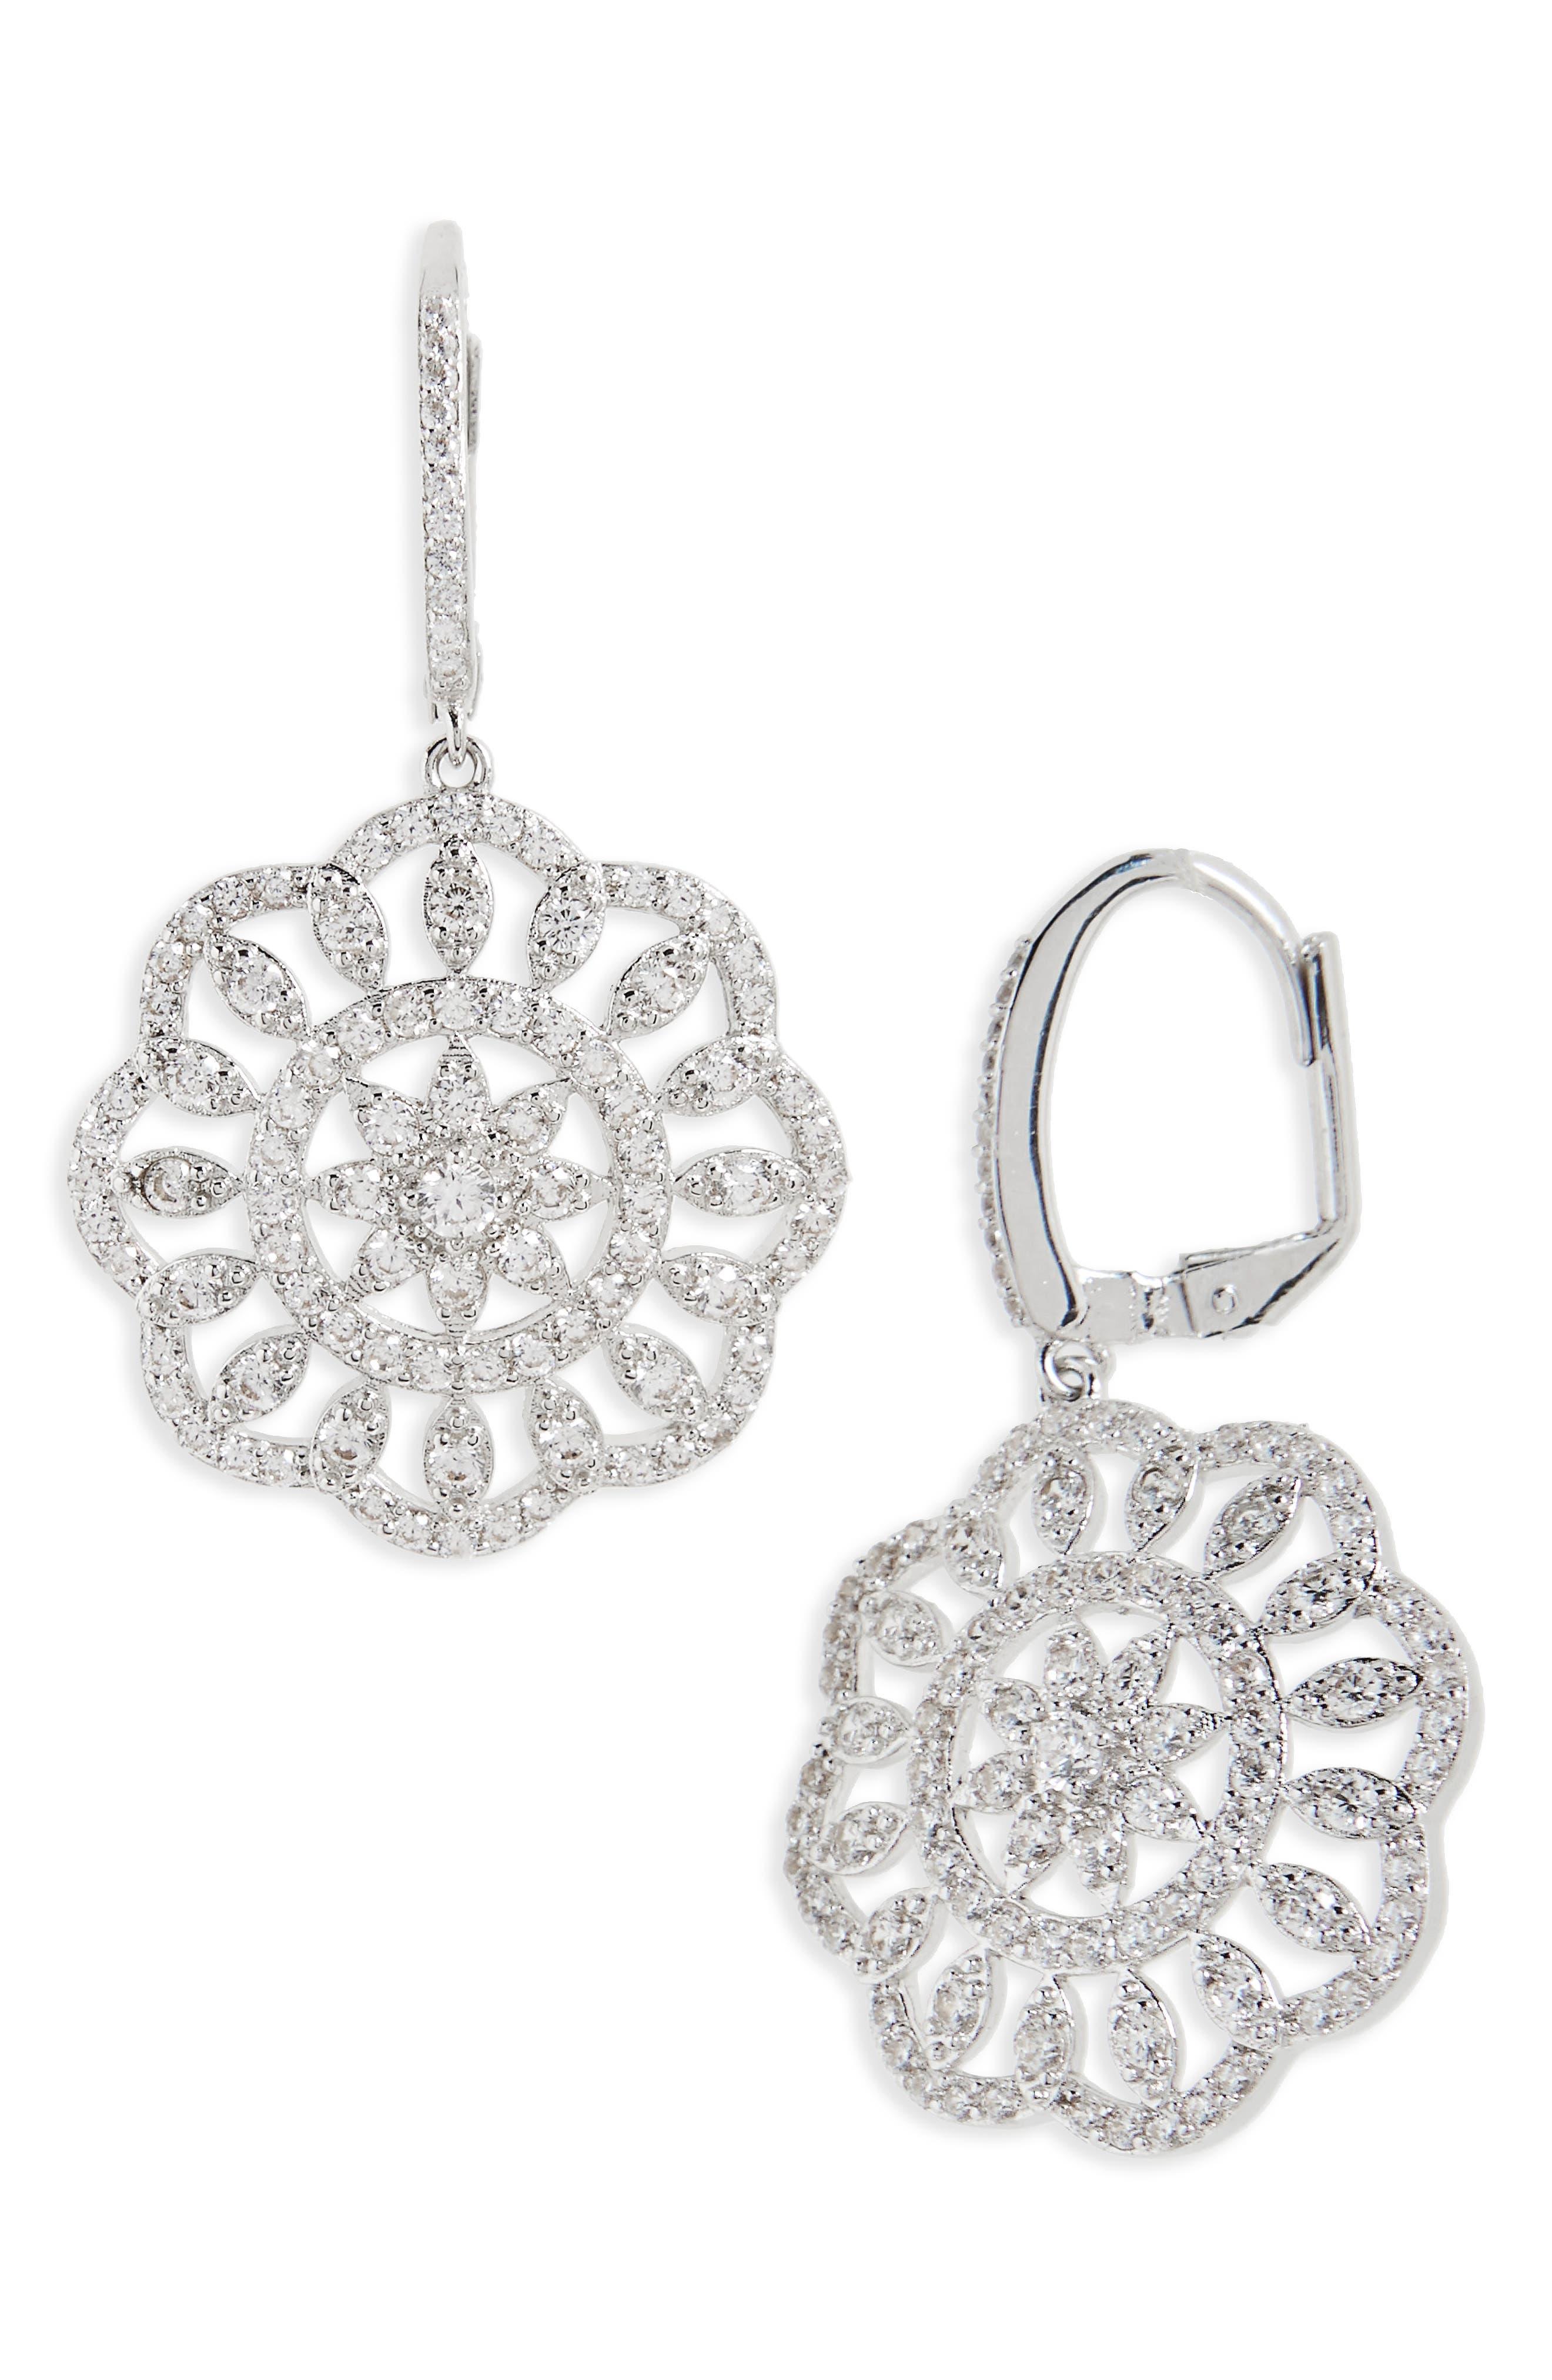 Sunburst Drop Earrings,                         Main,                         color, Silver